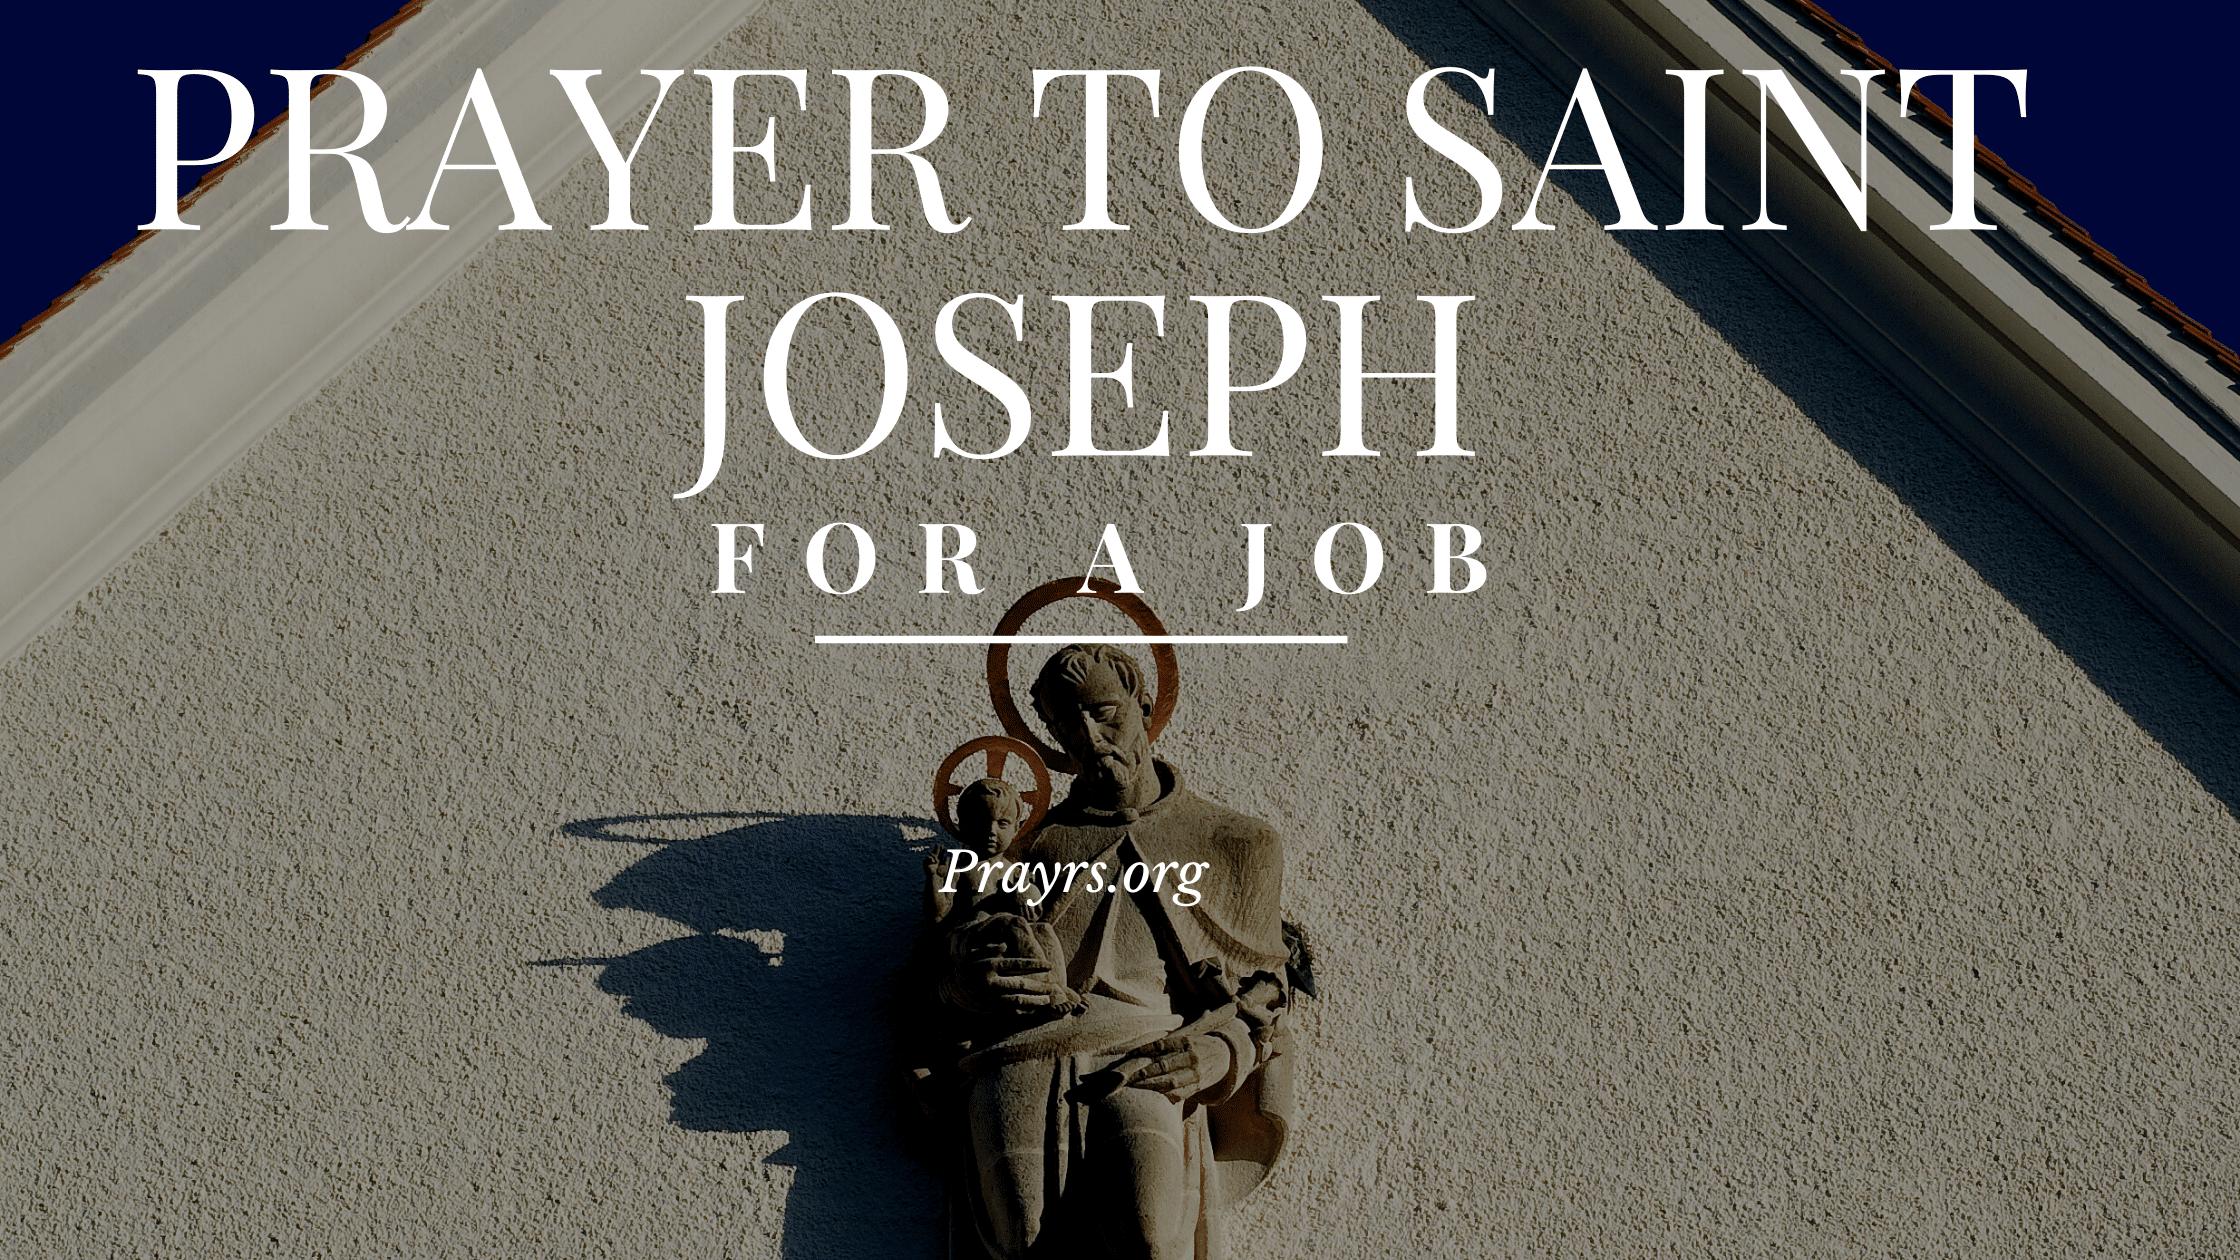 Prayers to St Joseph for a Job